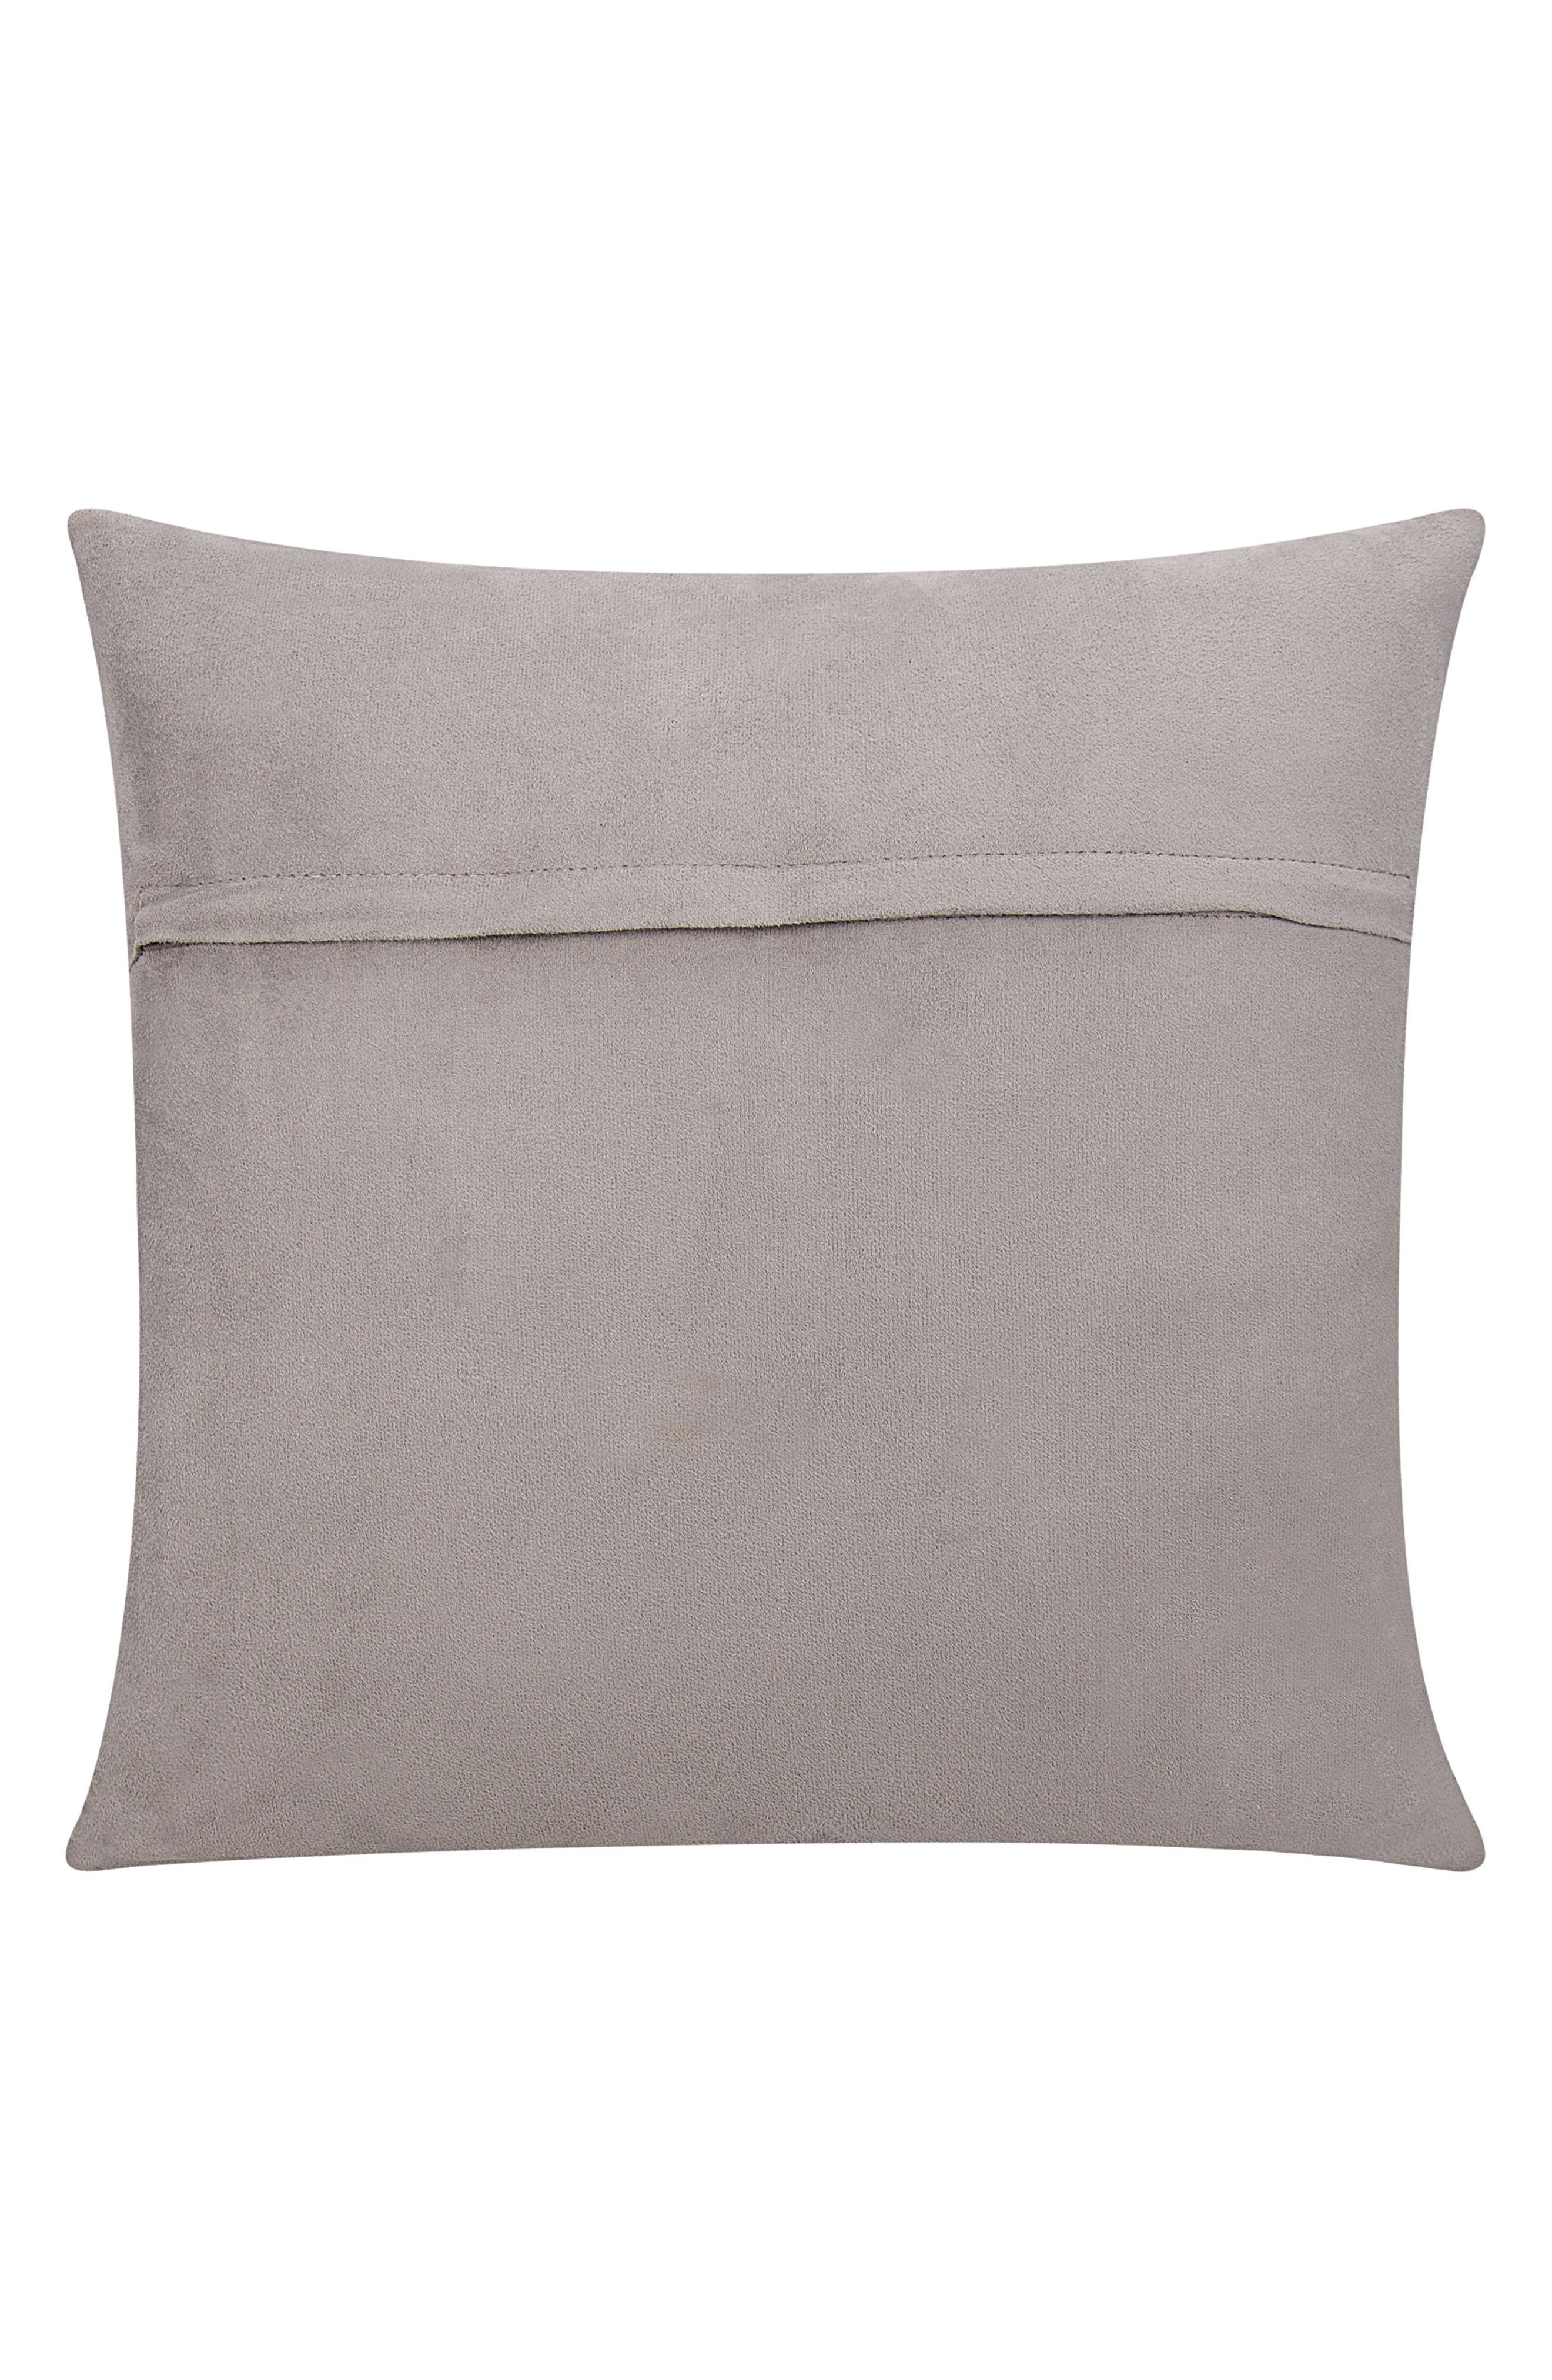 Calf Hair Accent Pillow,                             Alternate thumbnail 2, color,                             062